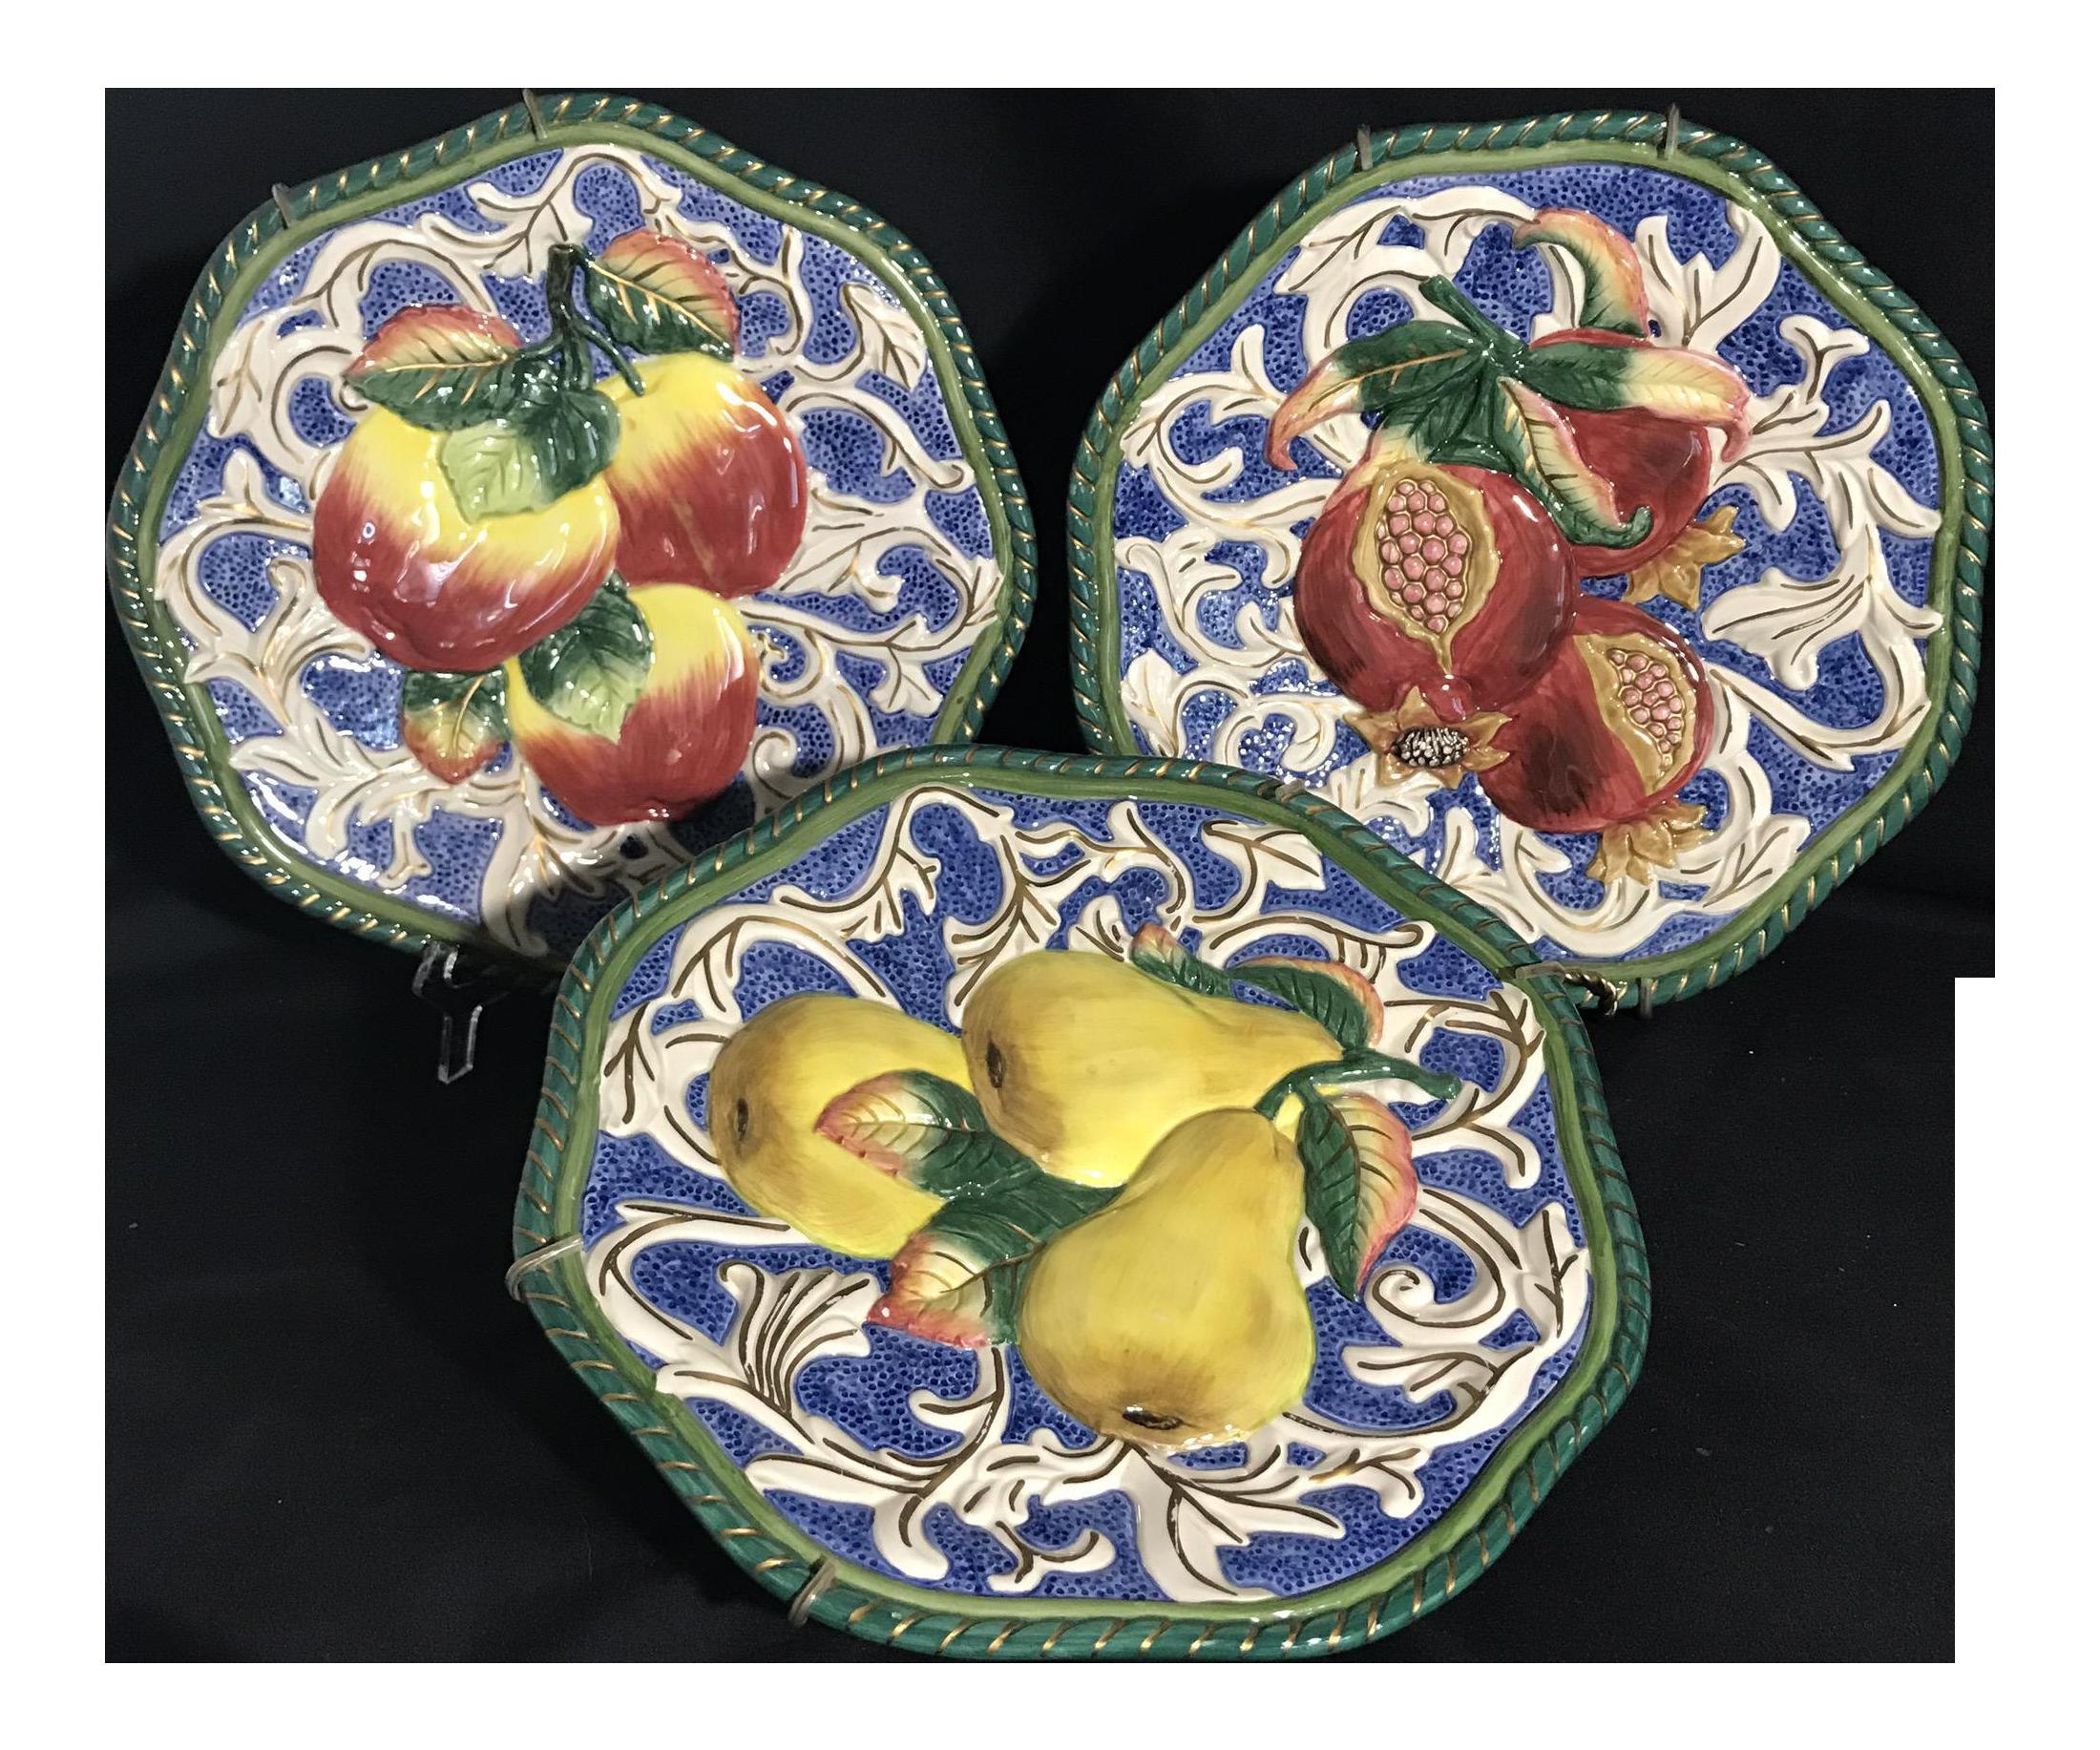 Fitz u0026 Floyd Florentine Fruit Canapé Wall Plates - Set of 3 - Image 1 of  sc 1 st  Chairish & Fitz u0026 Floyd Florentine Fruit Canapé Wall Plates - Set of 3 | Chairish